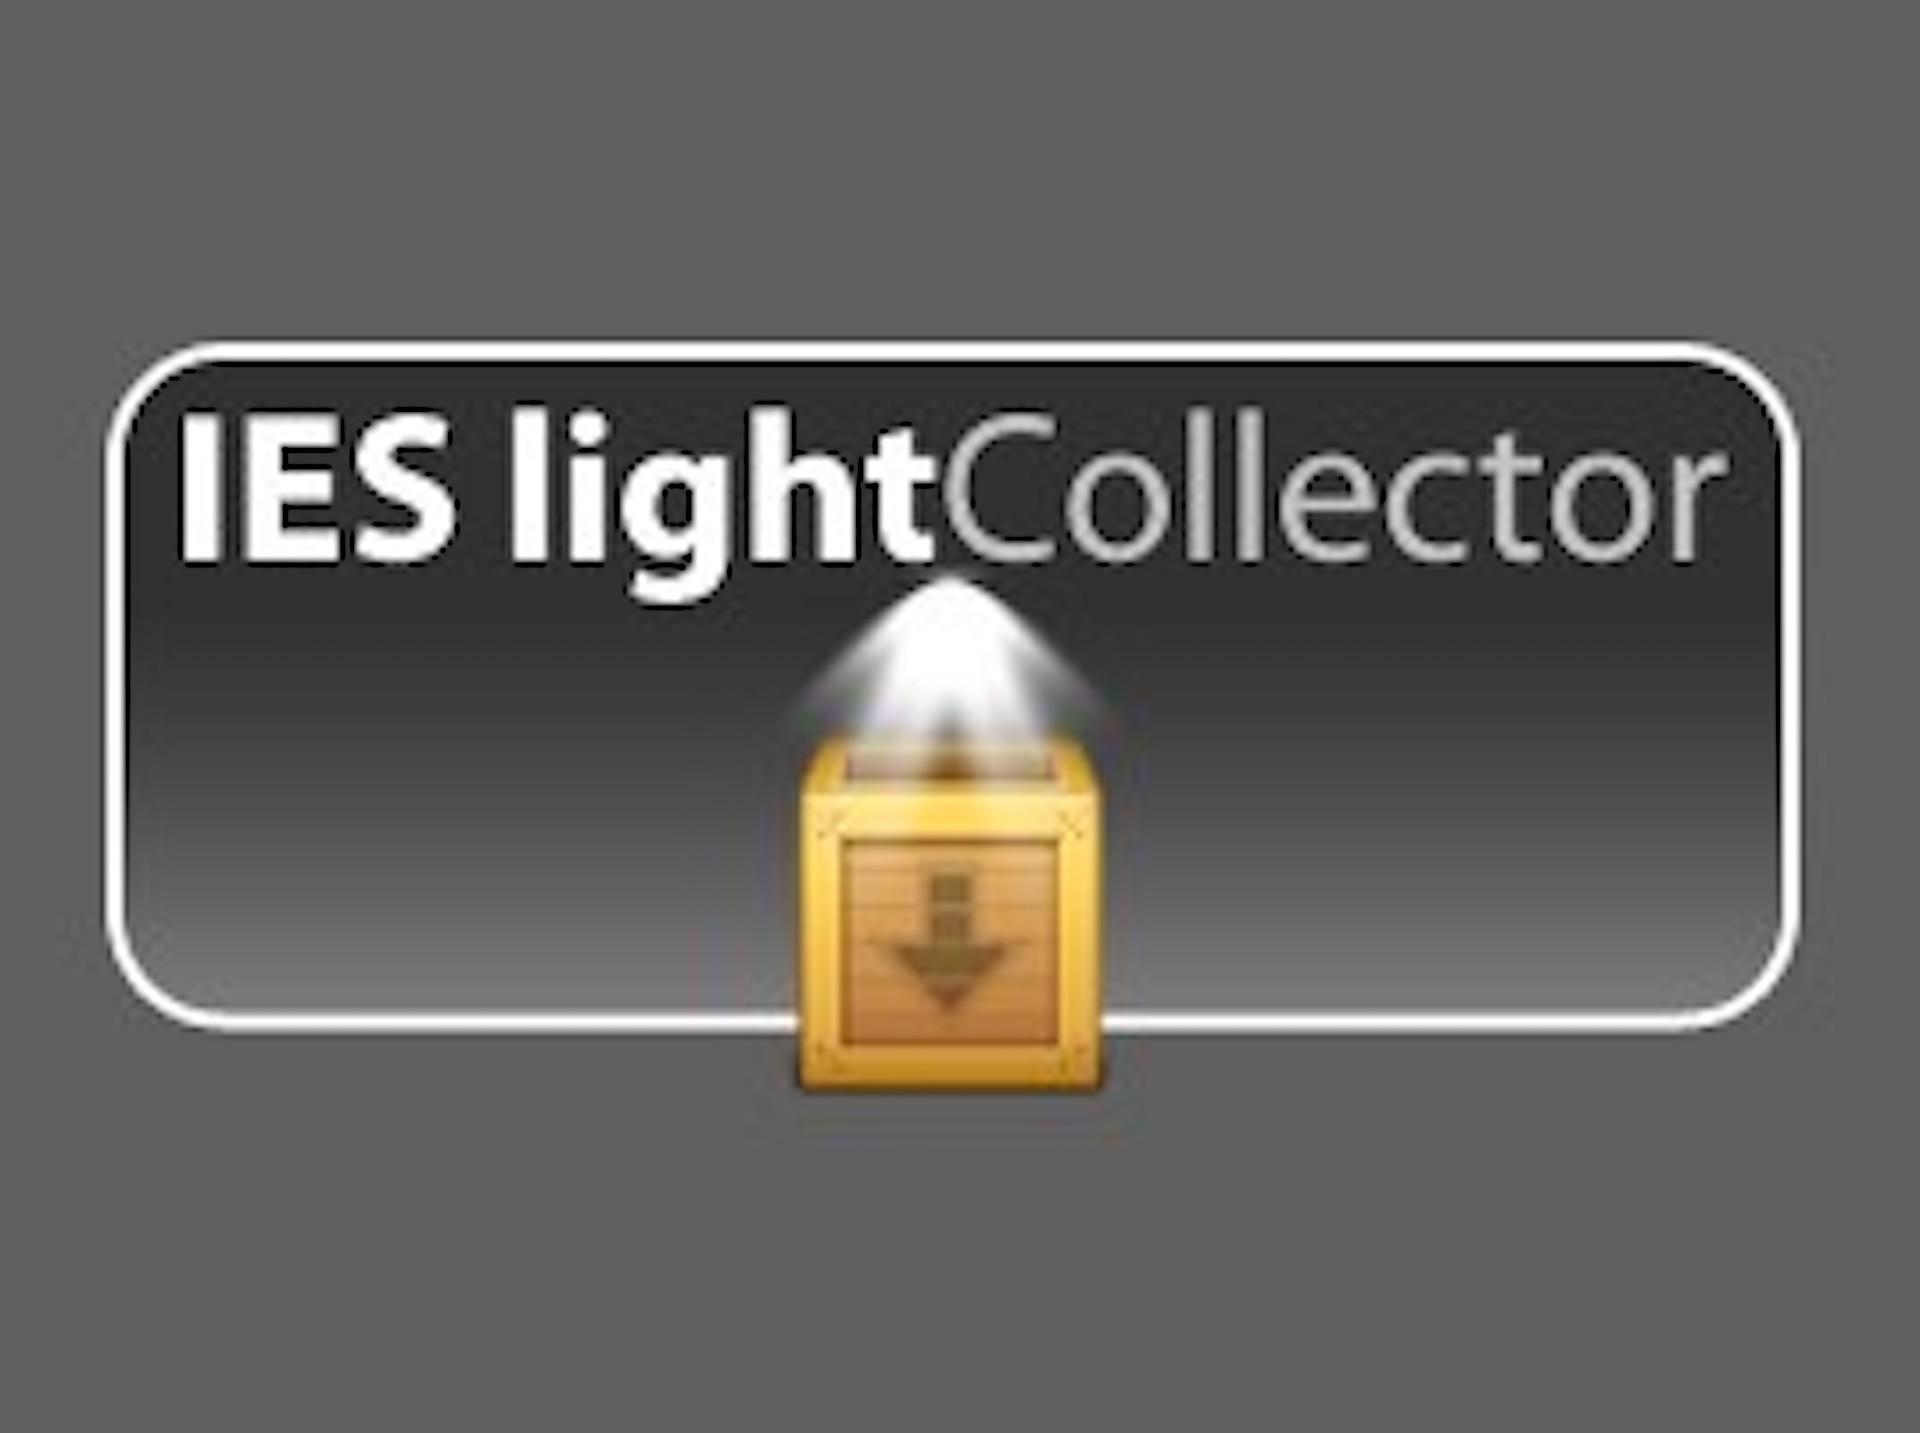 IES Light Collector Free plugin - News - Blog - C4Dzone